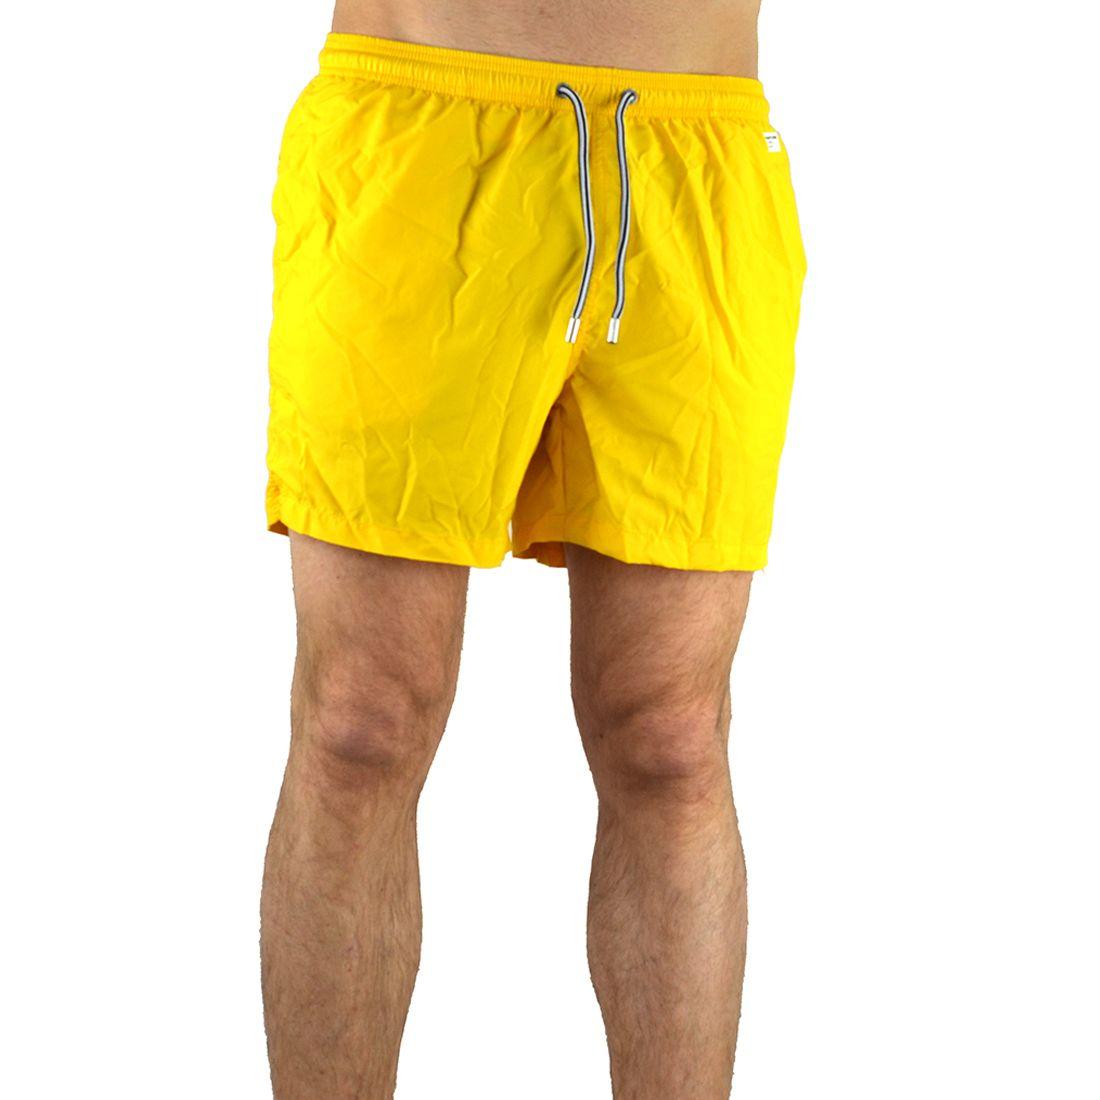 Mc2 Saint Barth Men's Yellow Polyester Trunks